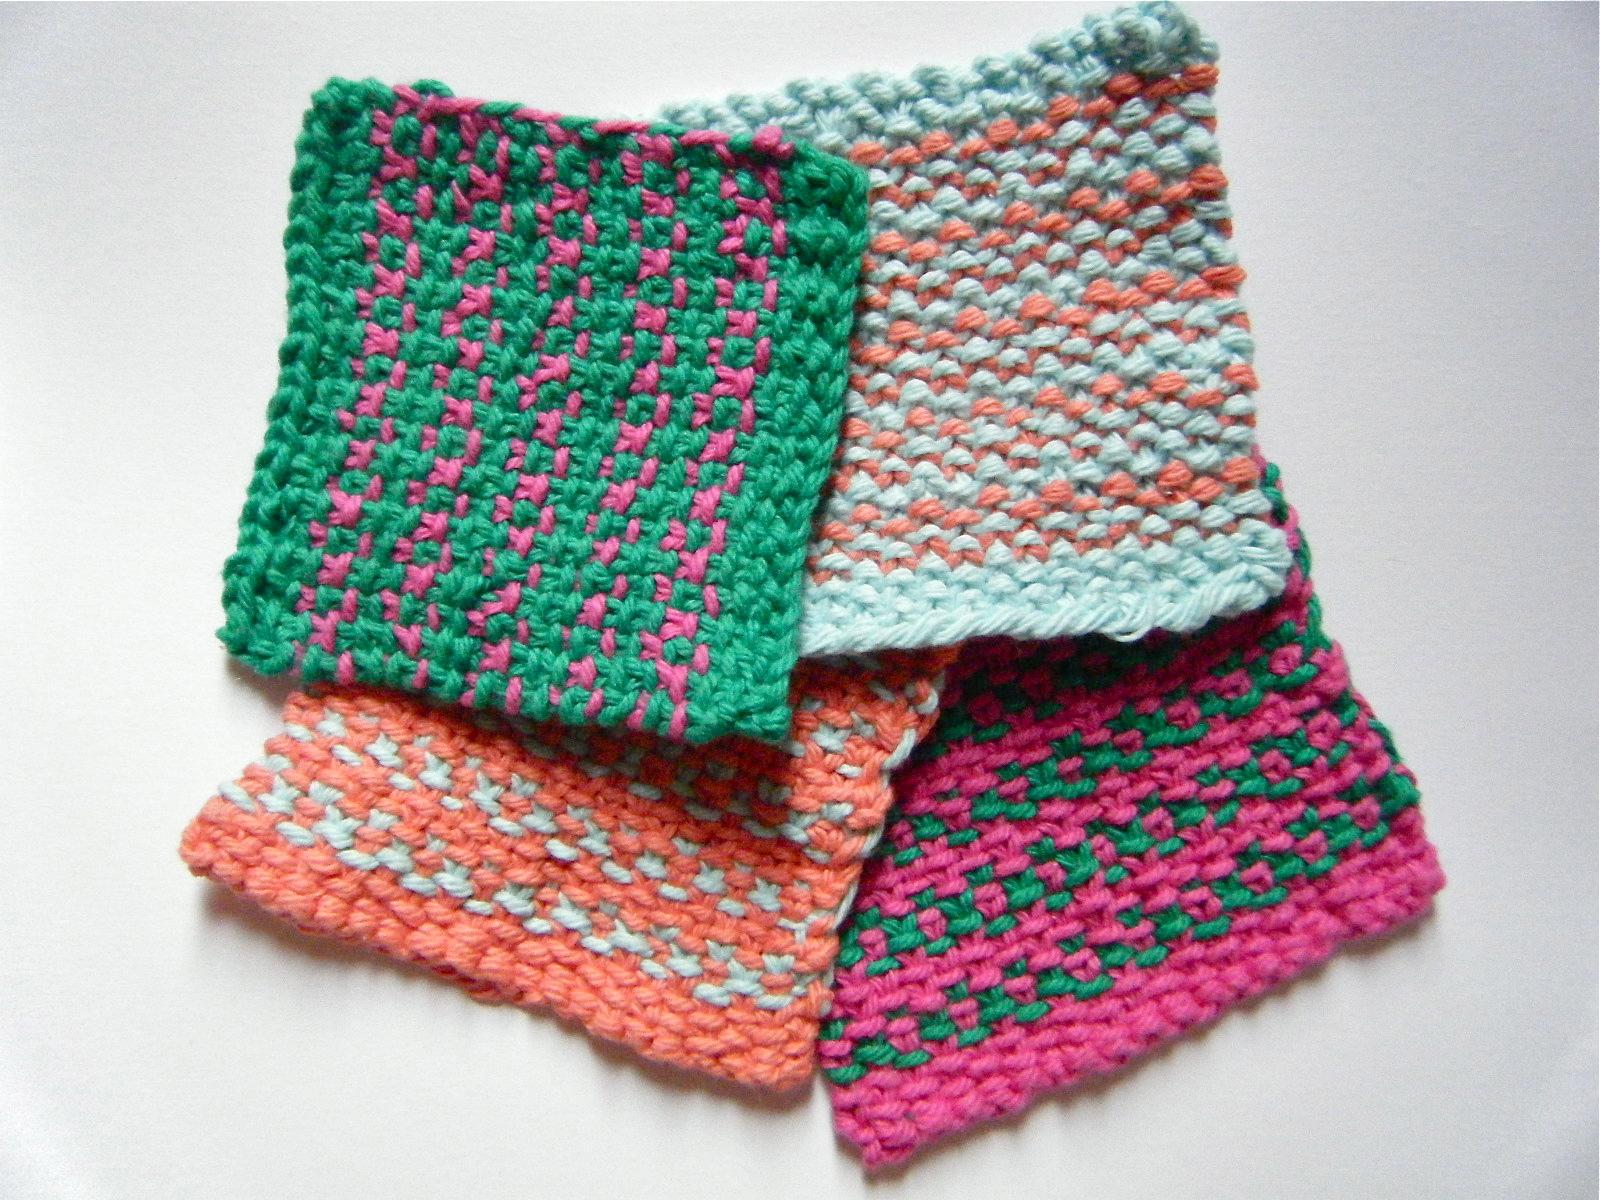 Knit Coaster Pattern : Tribal Stripe Coasters {Knitting Pattern!} prairiesque